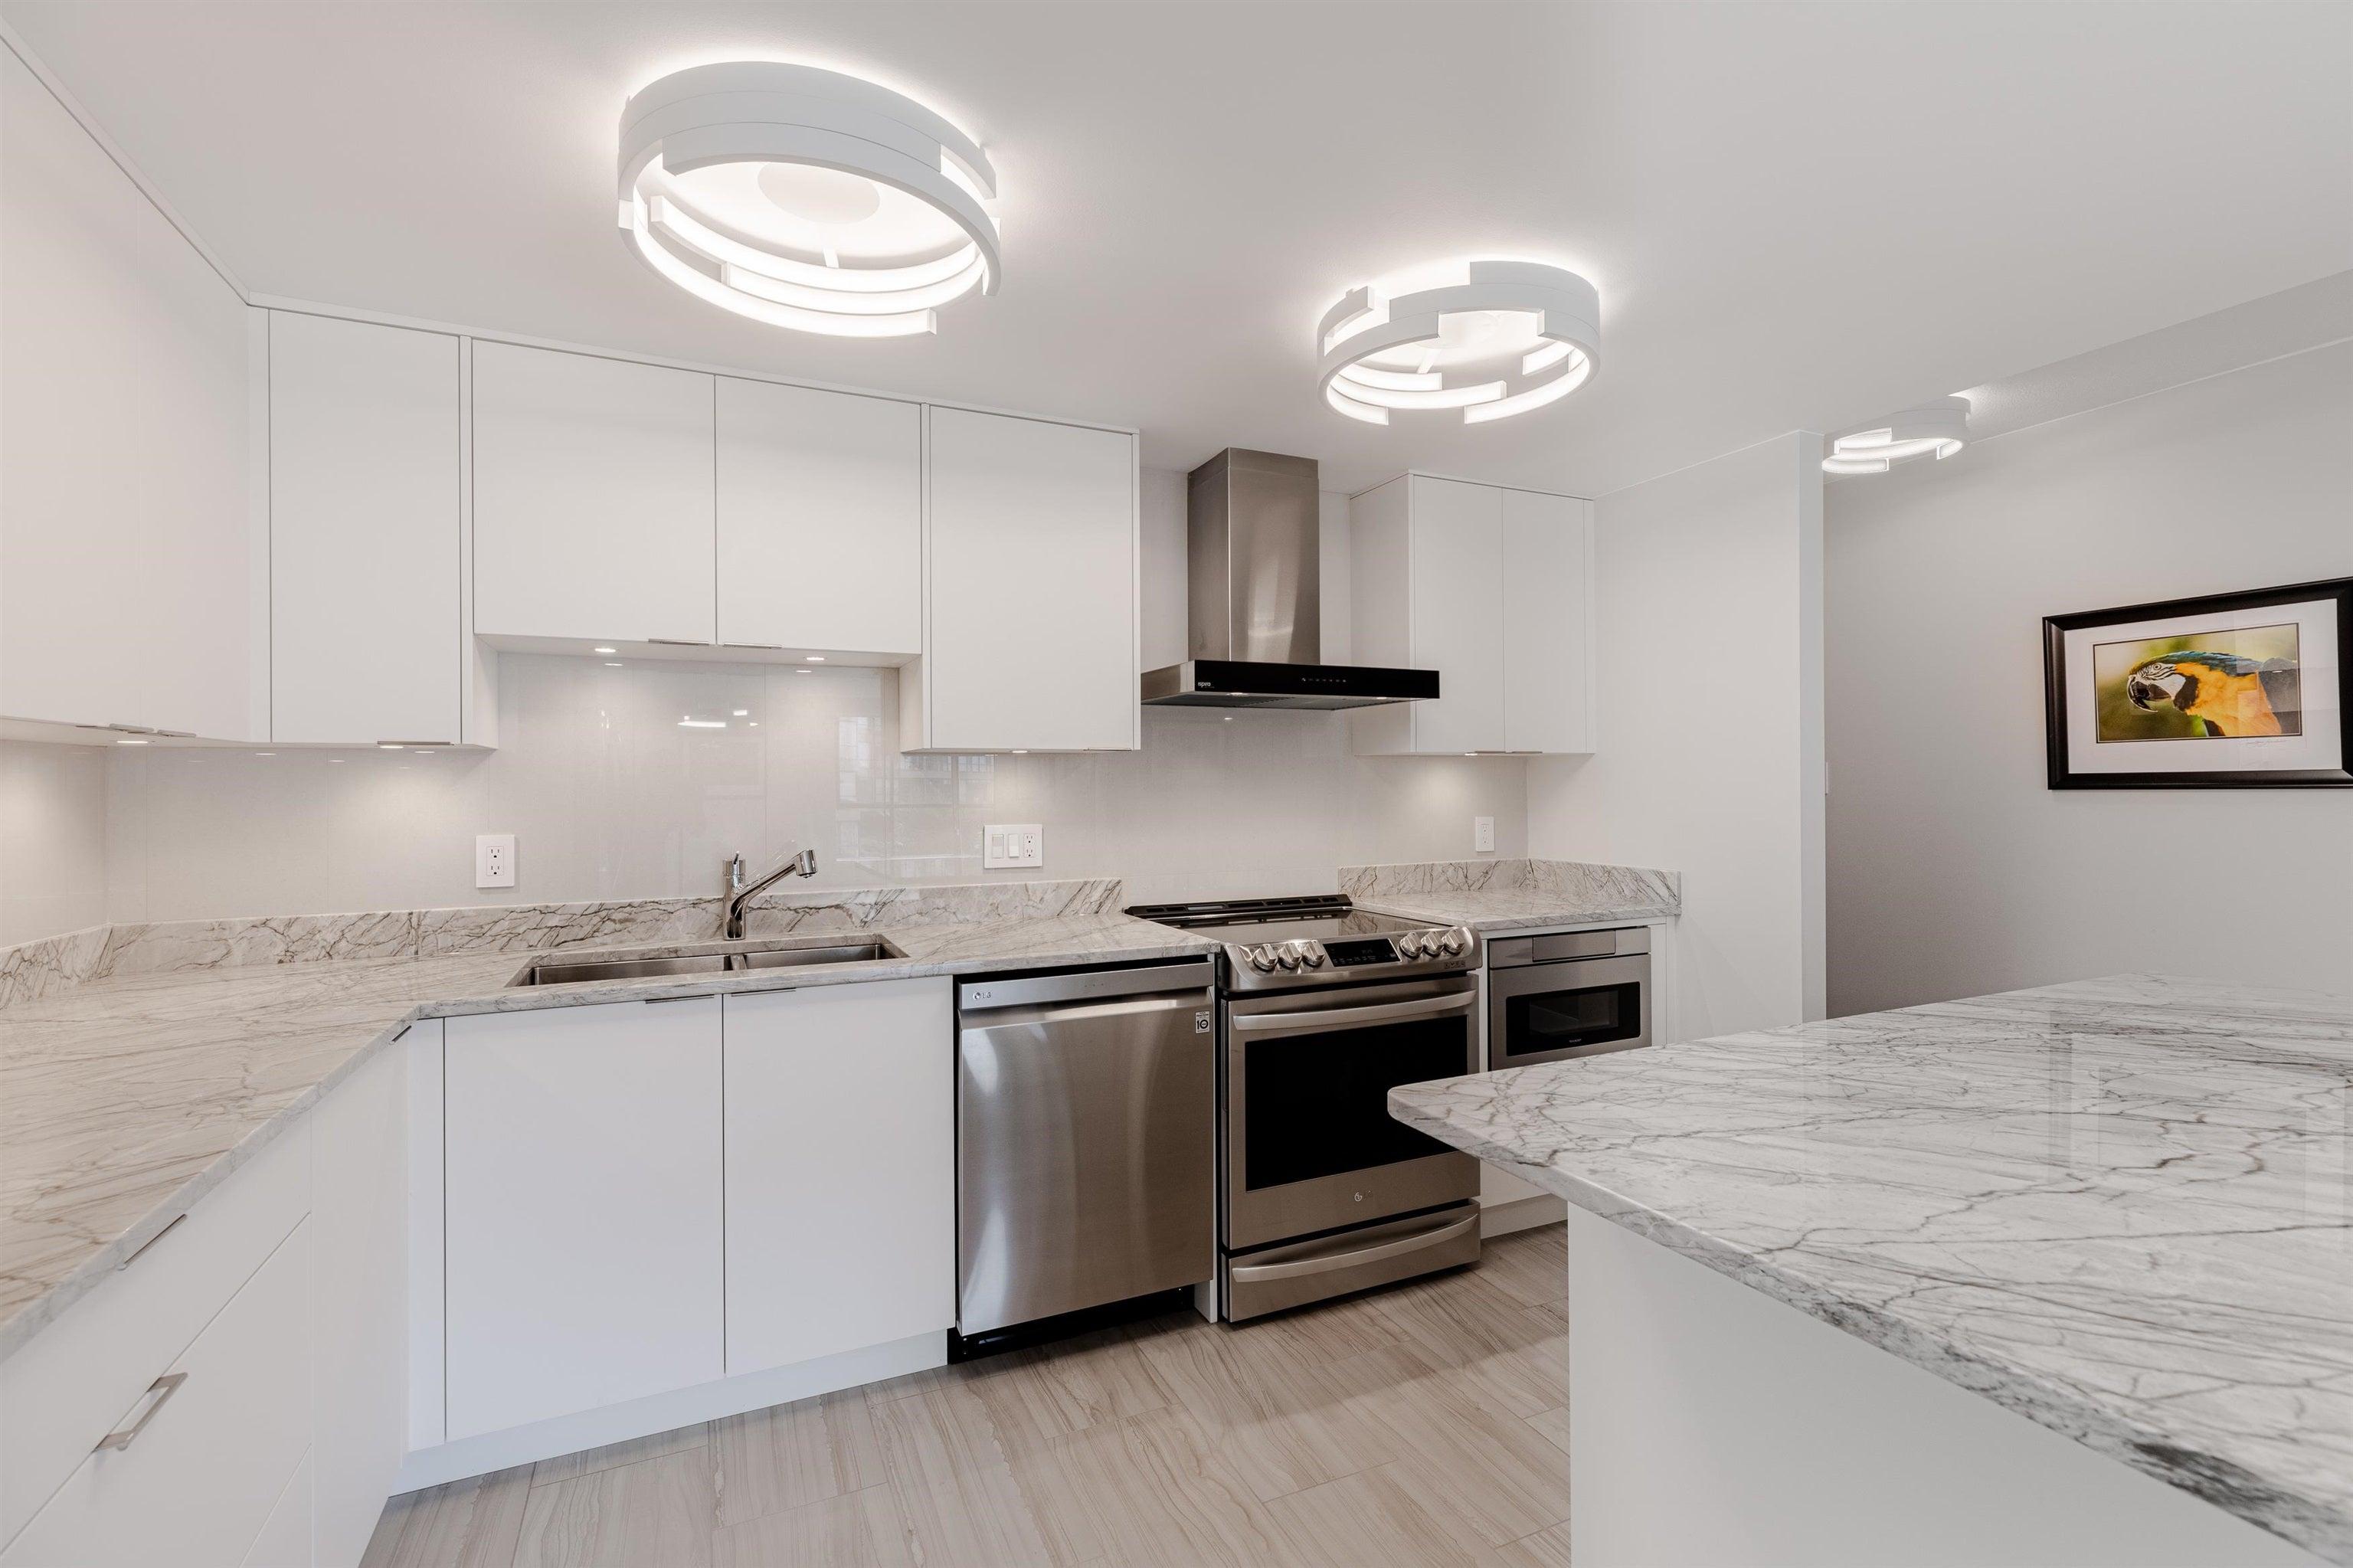 406 1450 PENNYFARTHING DRIVE - False Creek Apartment/Condo for sale, 2 Bedrooms (R2617259) - #8